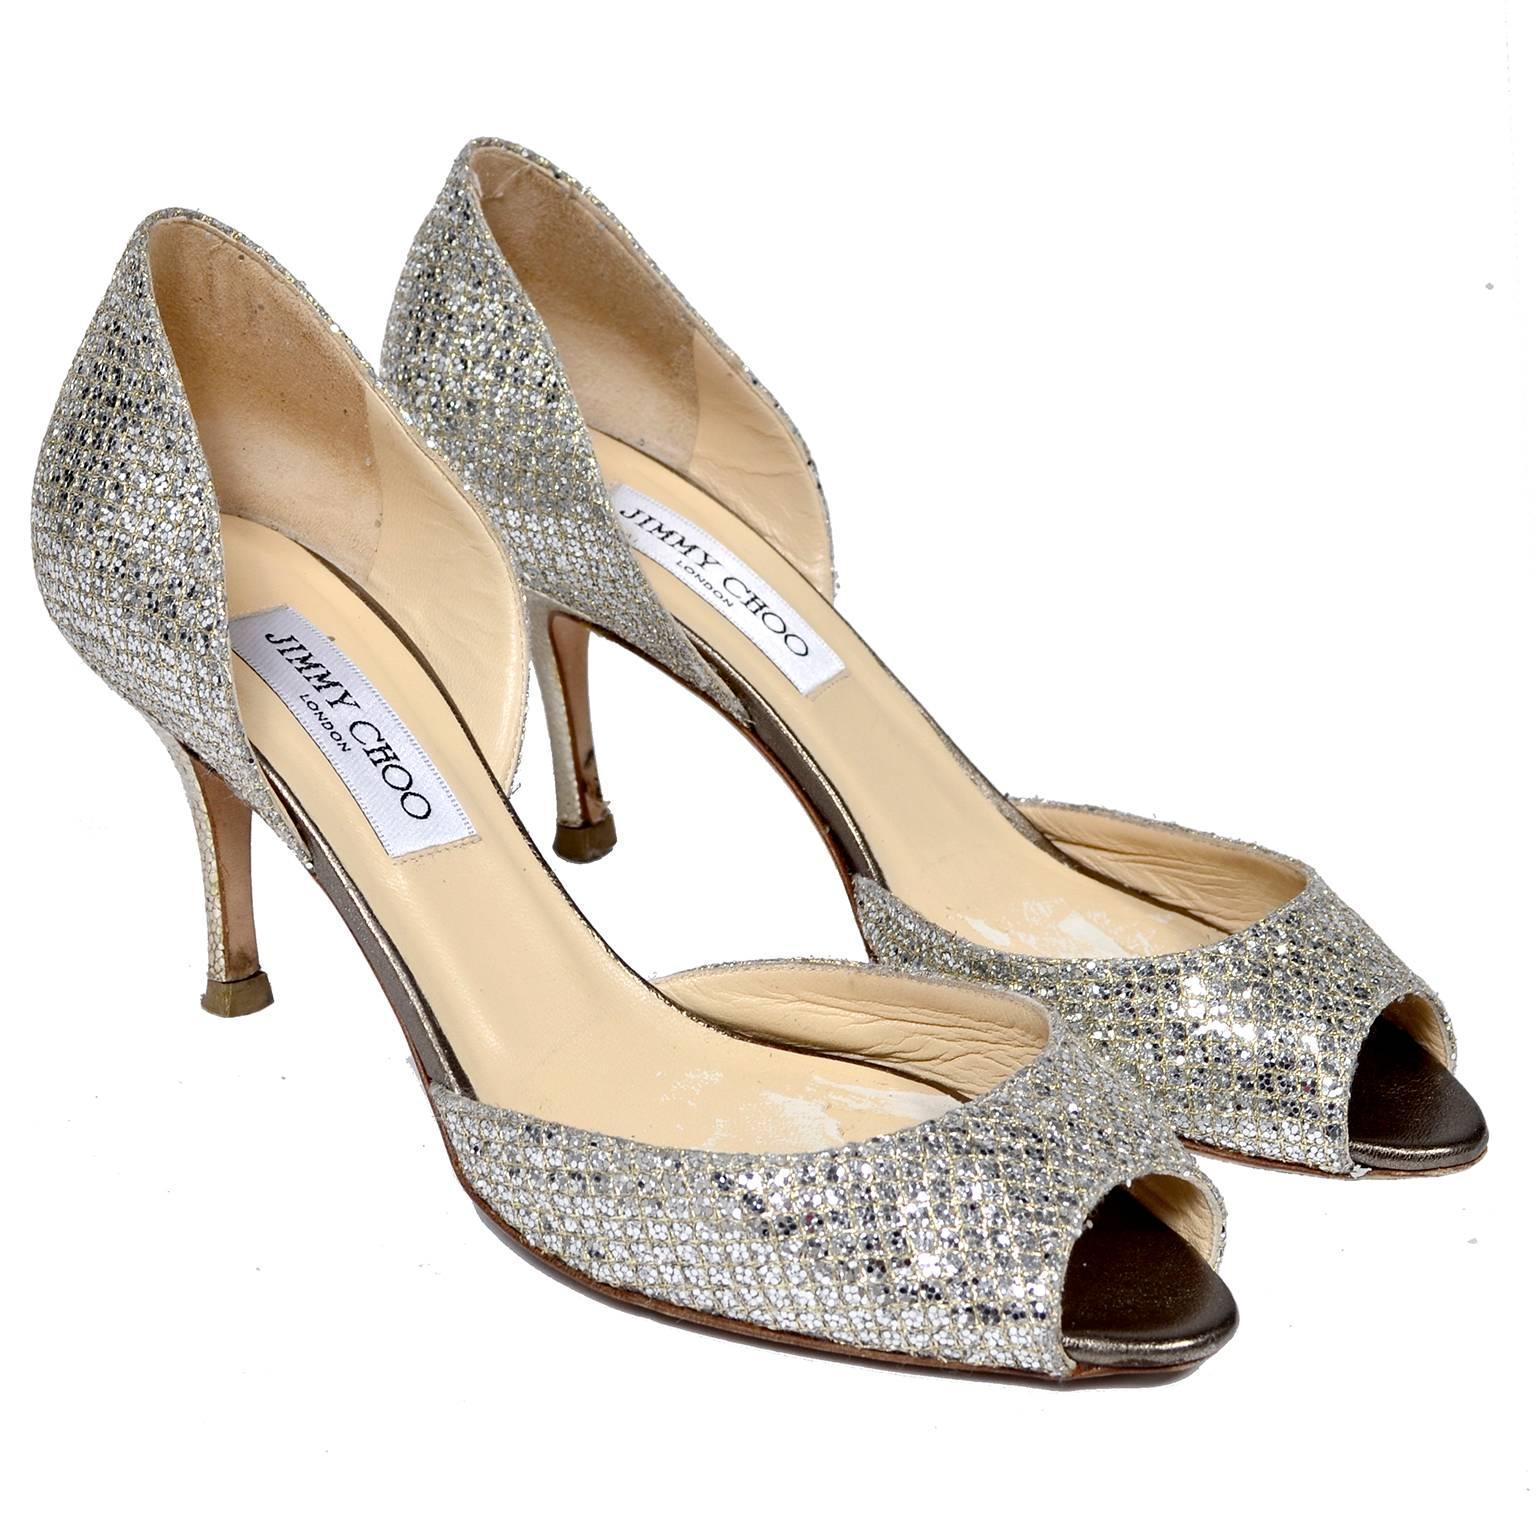 jimmy choo shoes d orsay pumps in glitter champagne size 37 5 w box rh 1stdibs com